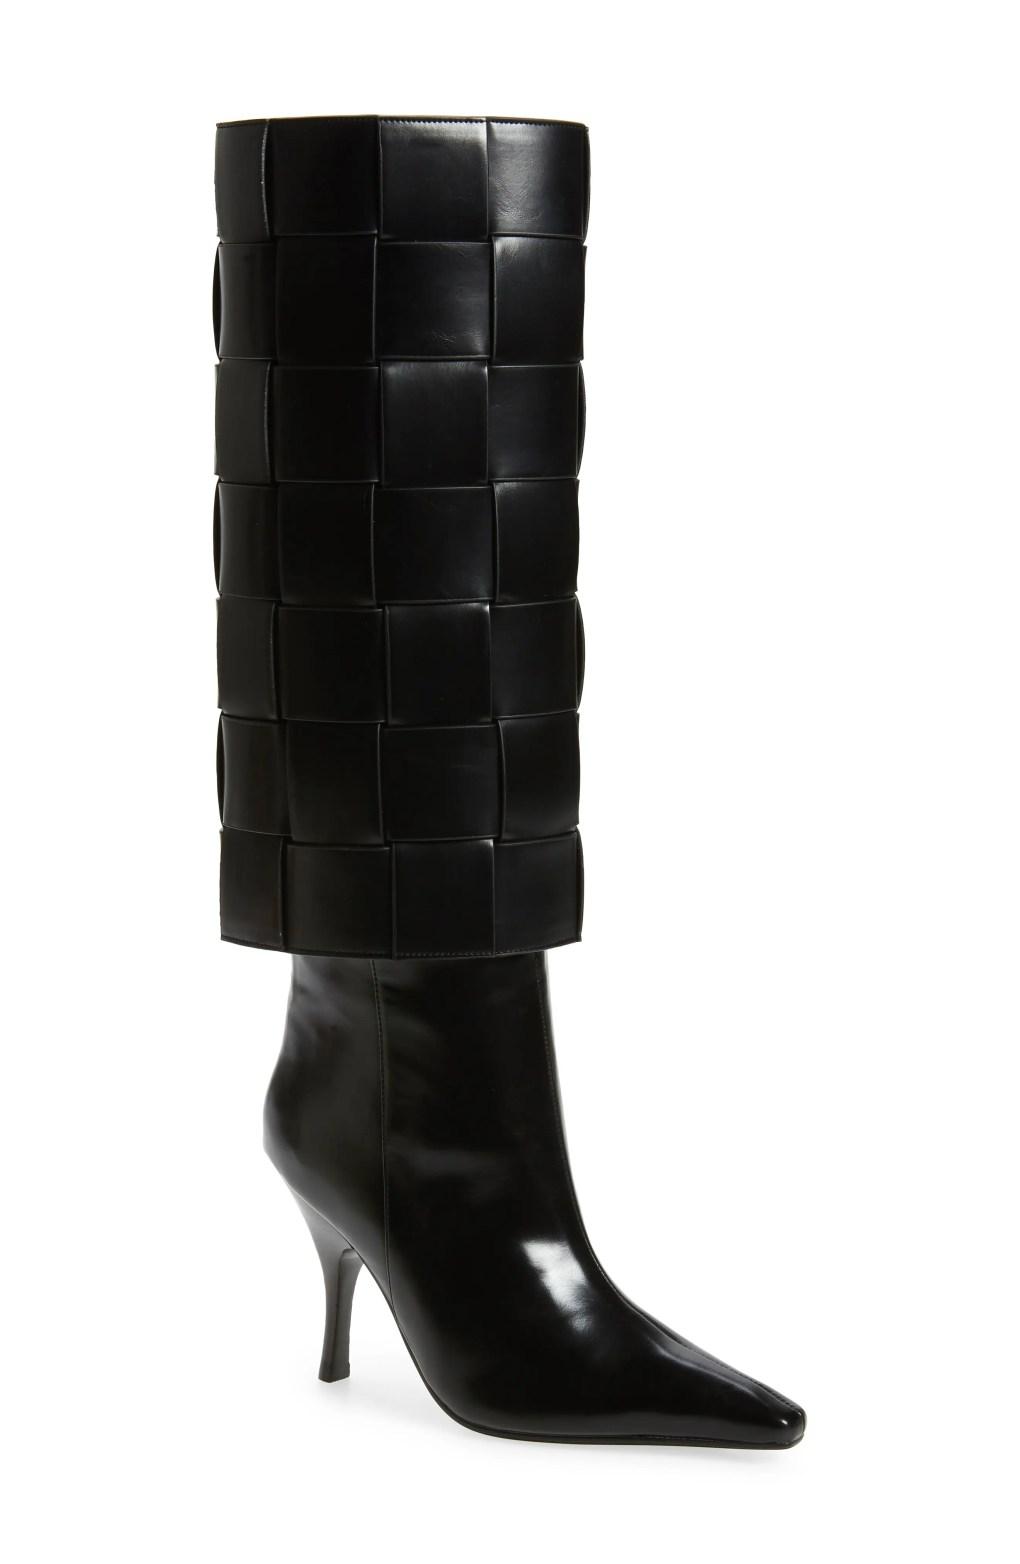 Jeffrey Campbell Skelter Knee High boots.